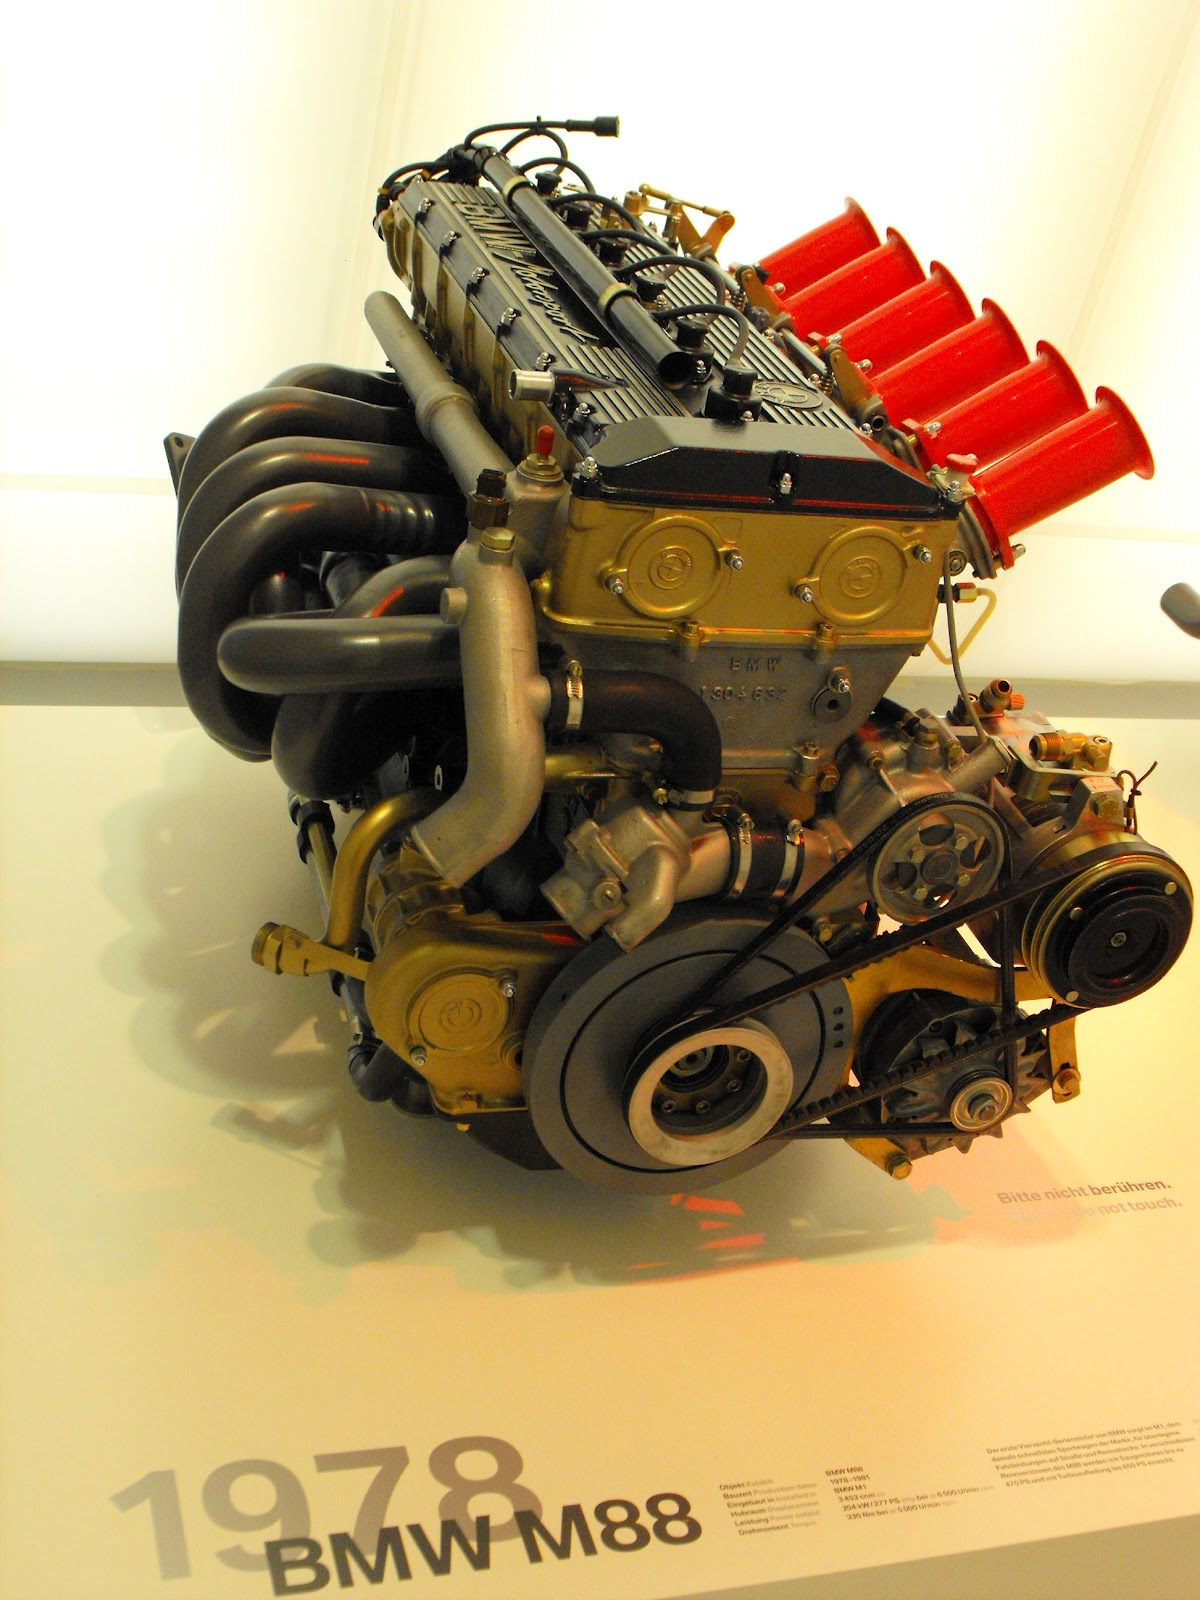 The 325is Bmw M88 M635csi E28 M5 Engine